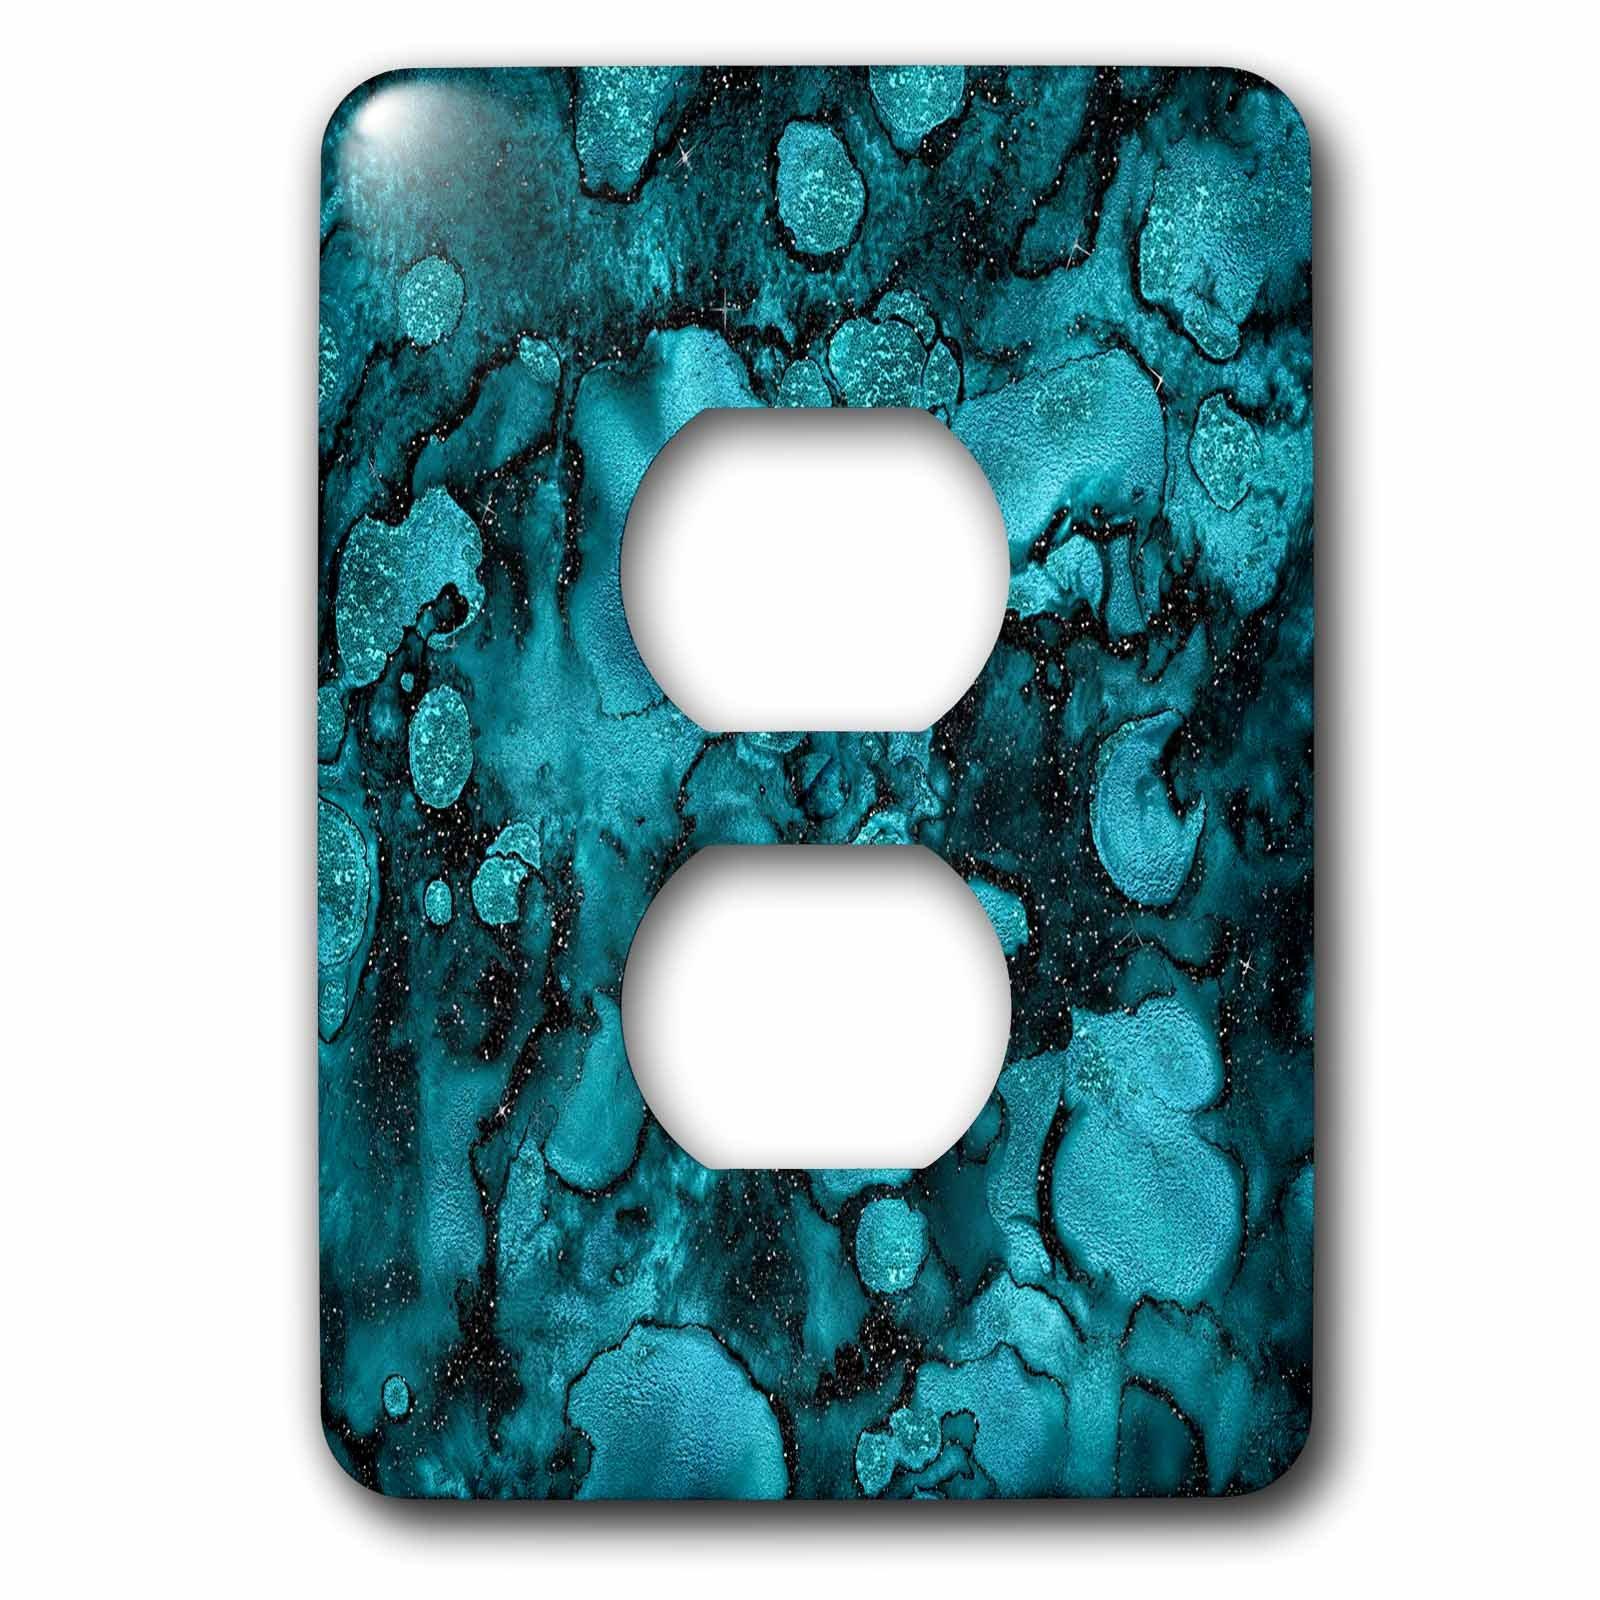 3dRose Uta Naumann Faux Glitter Pattern - Luxury Ink Malachite Ombre Gem Marble Glitter Metallic Faux Print - Light Switch Covers - 2 plug outlet cover (lsp_269024_6)